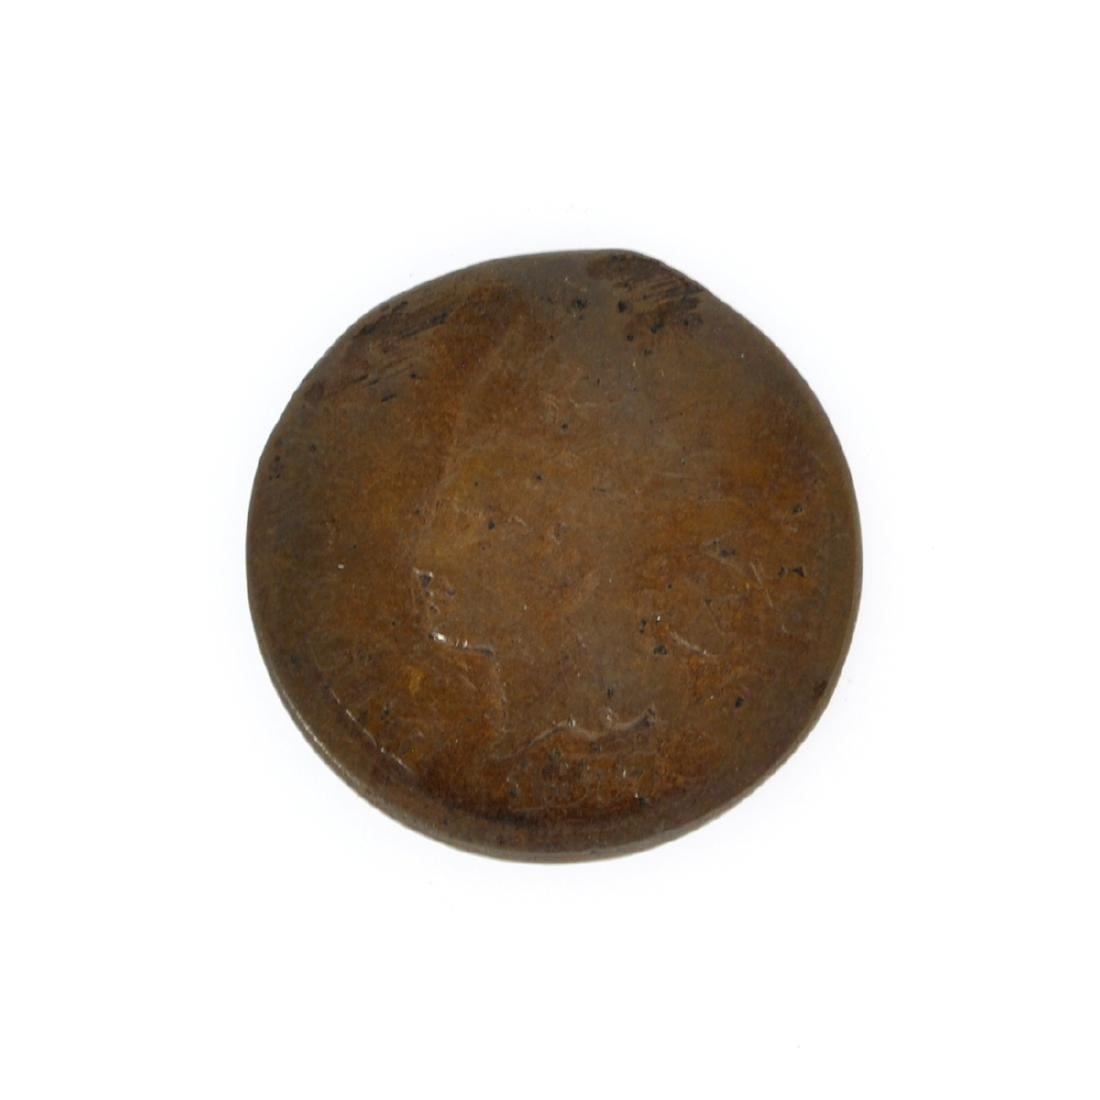 Rare 1877 Indian Cent Coin